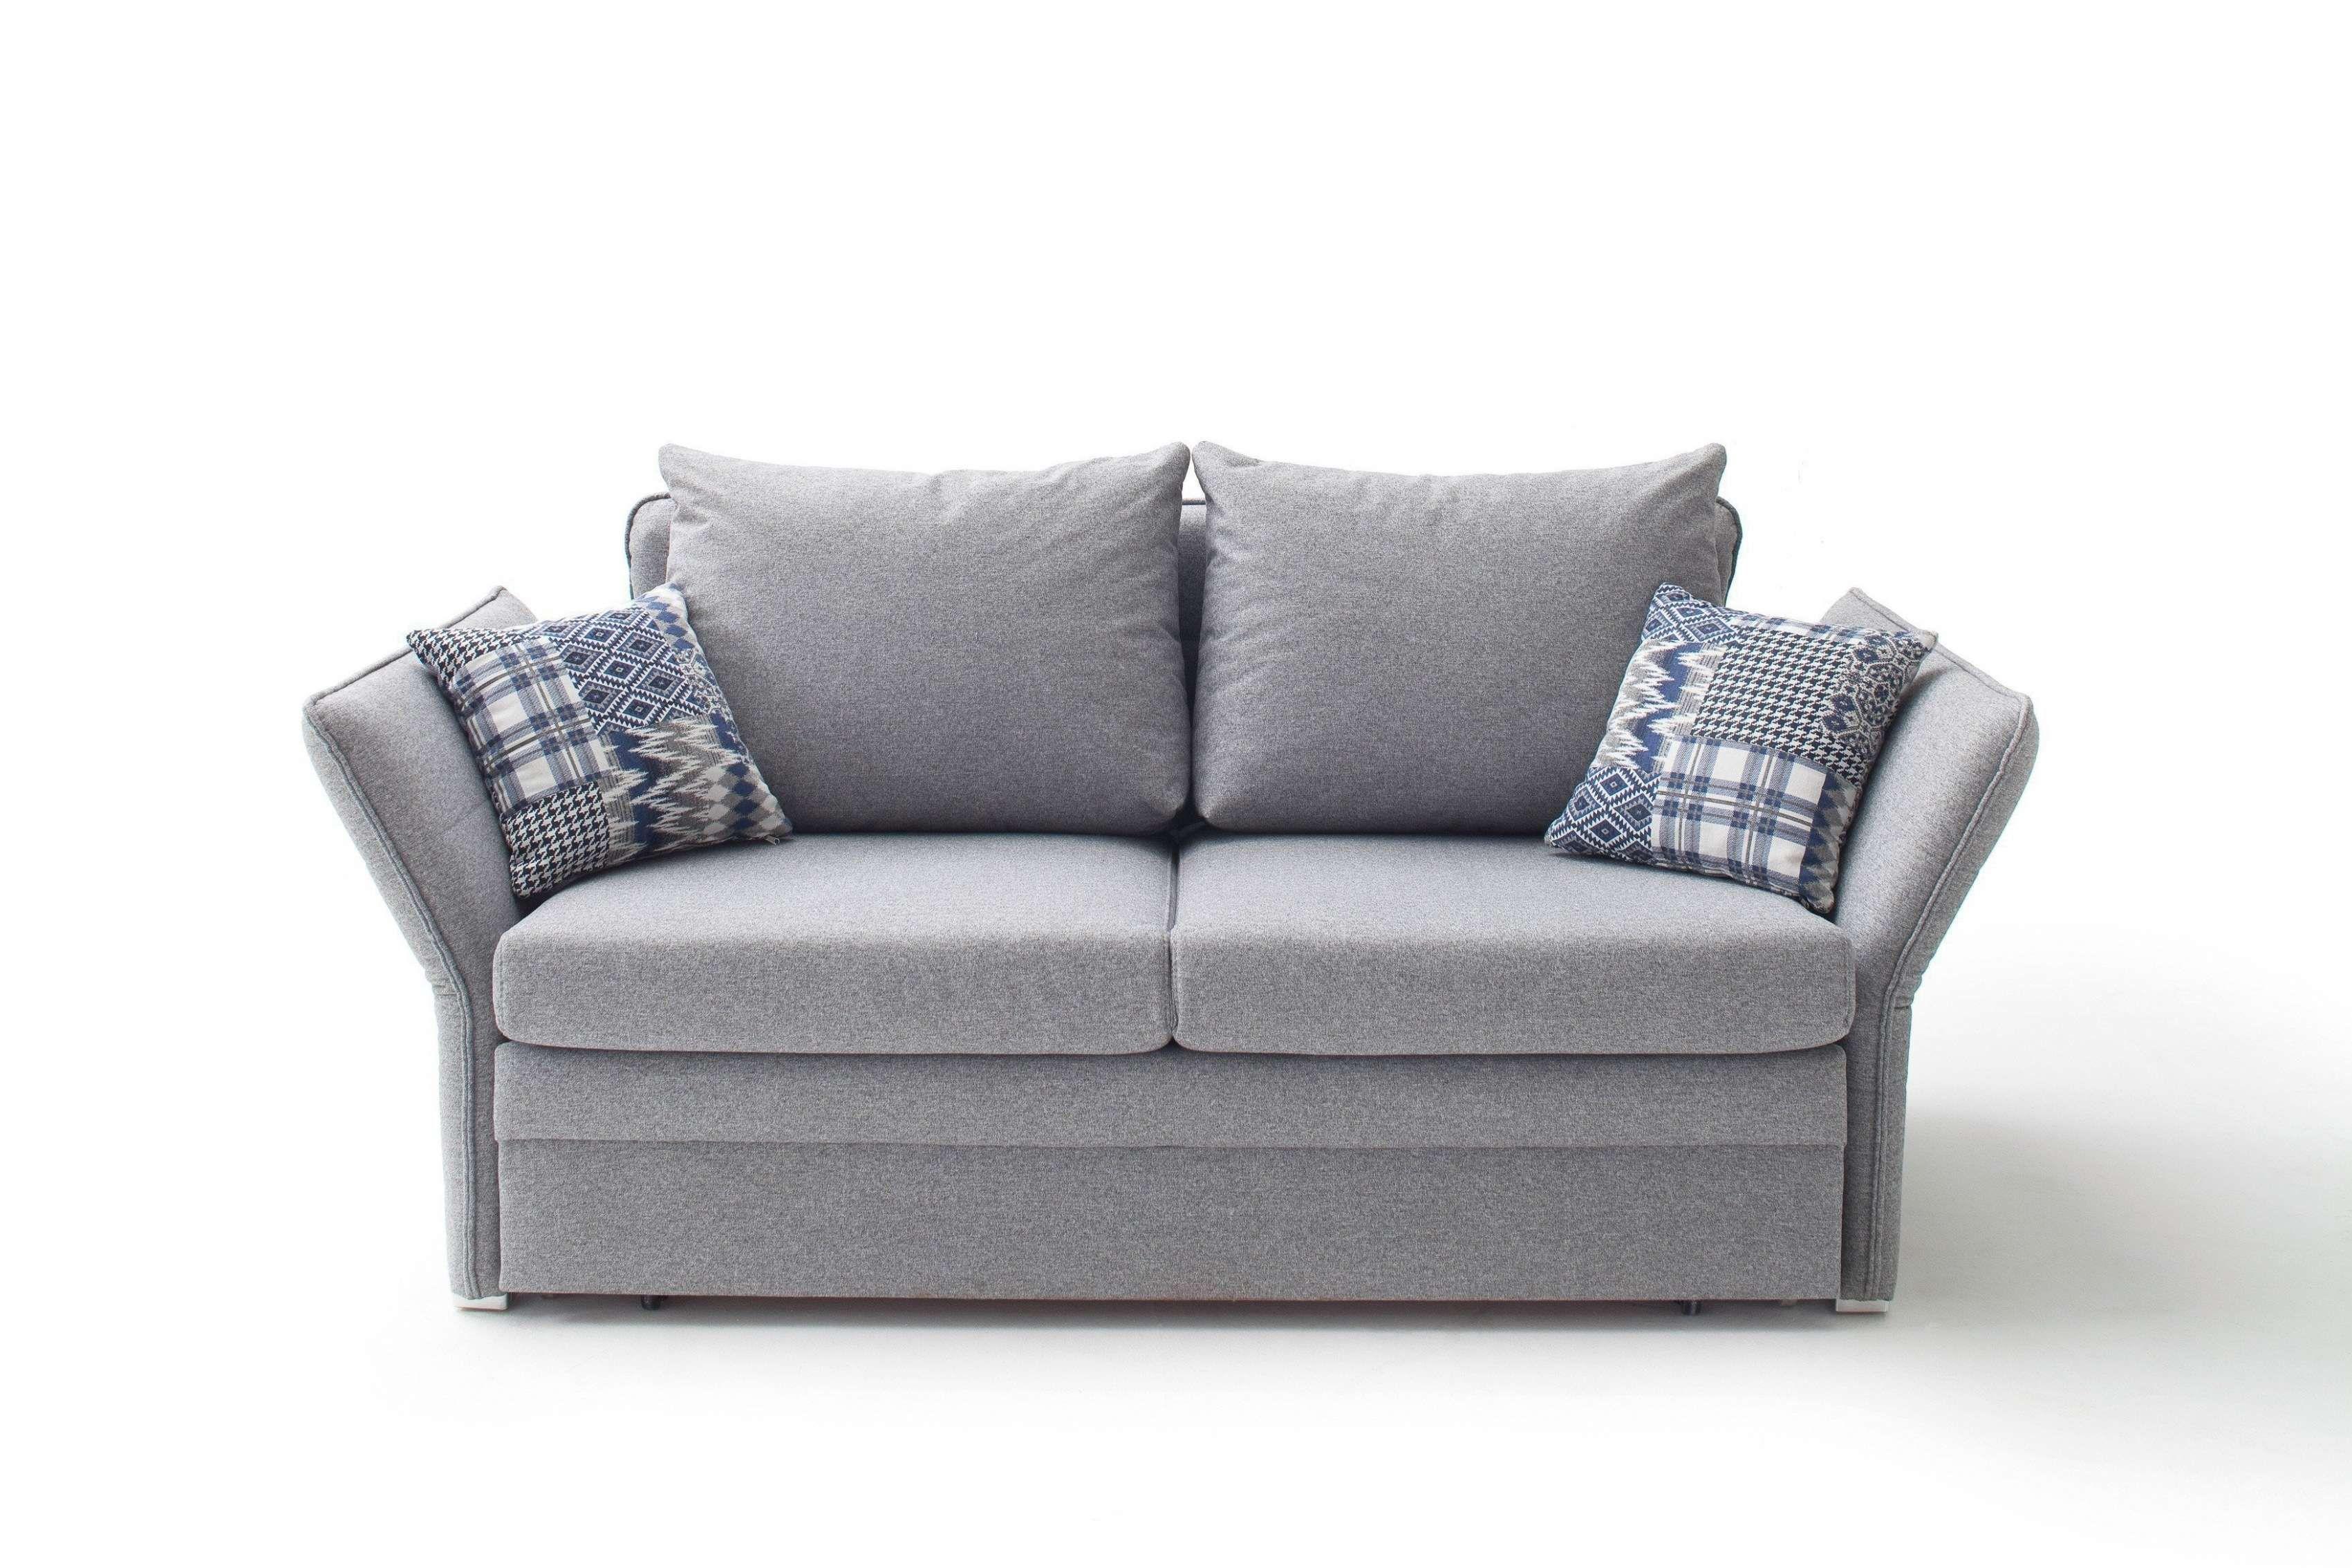 Ecksofa Leder Gunstig Ecksofa Gunstig Poco Elegant 28 Gunstig Sofa